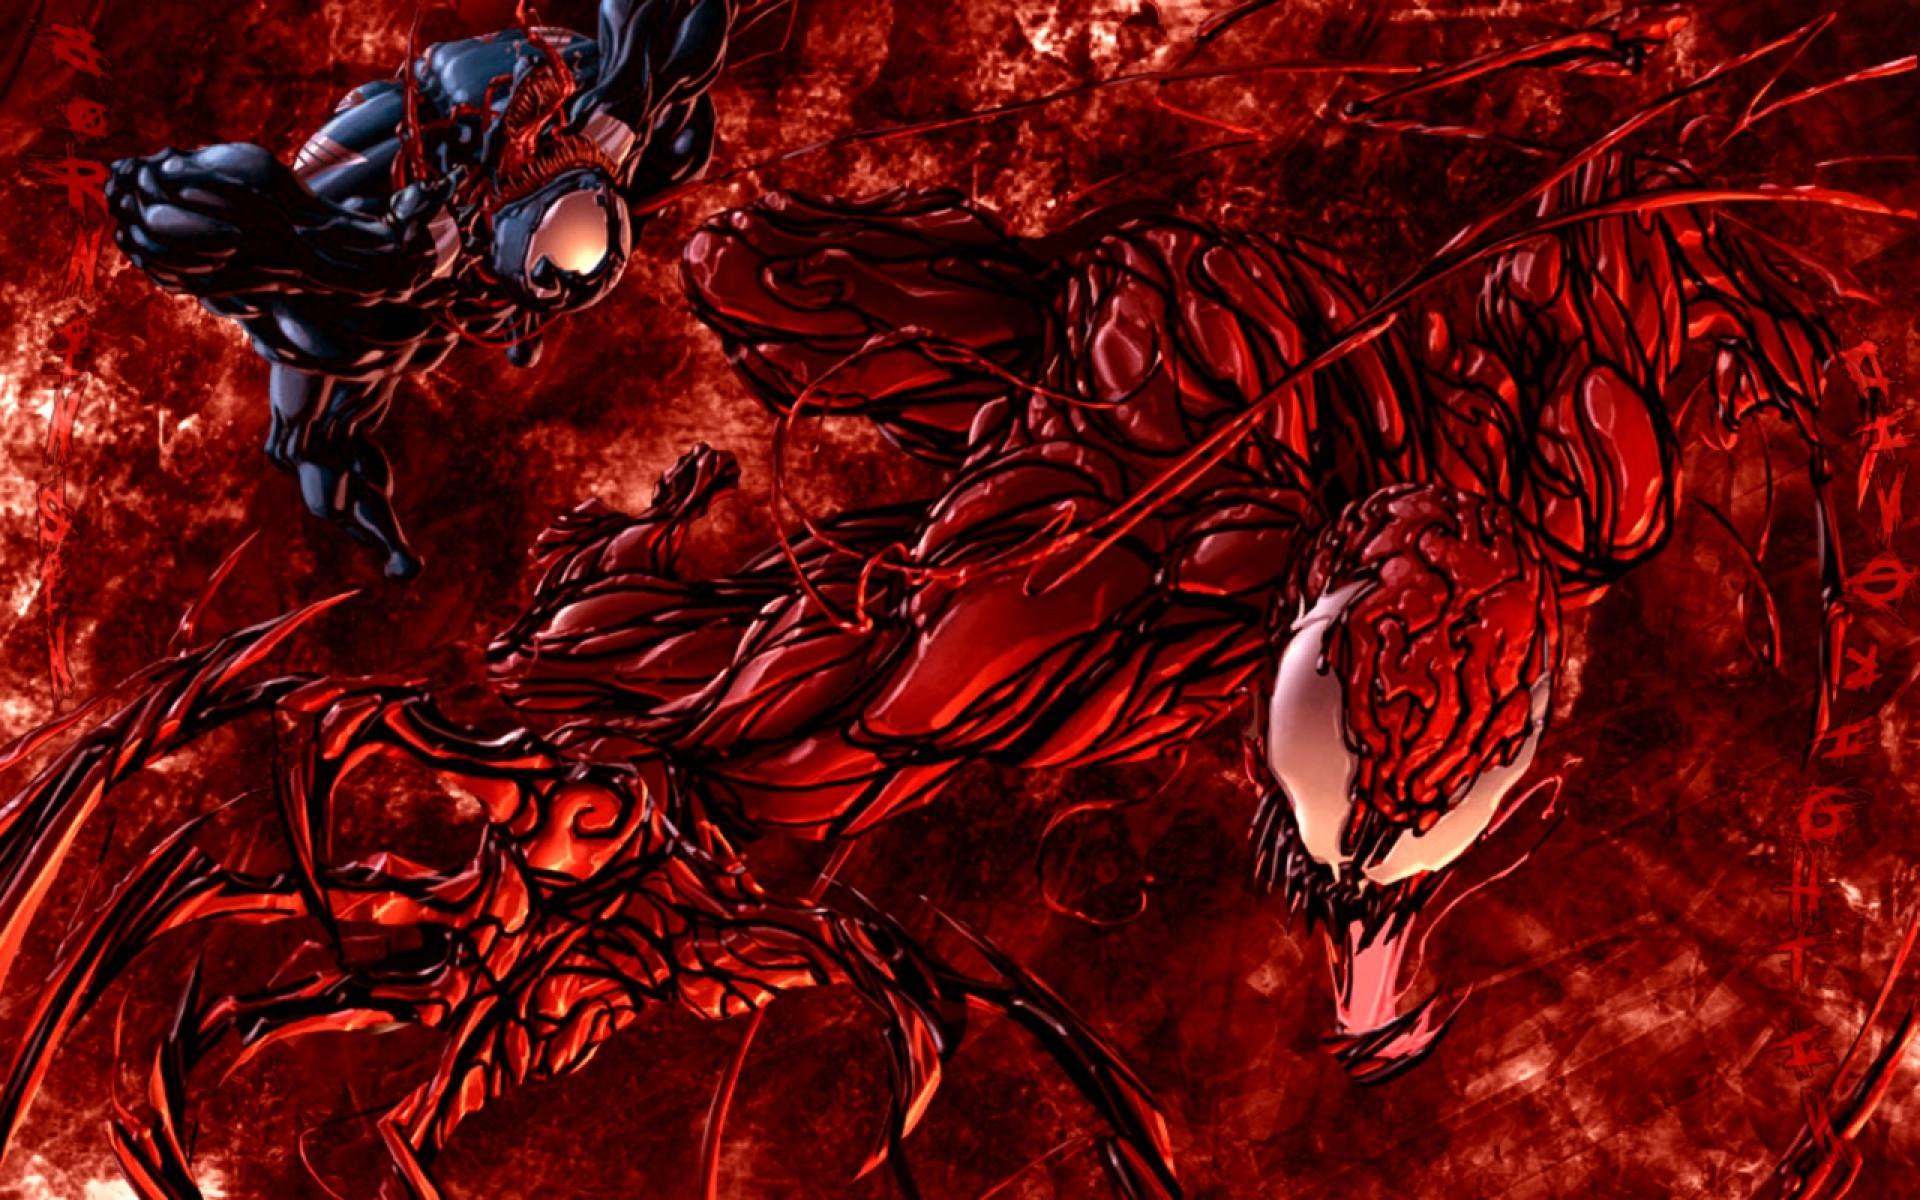 Carnage Wallpaper · Carnage Vs Venom …